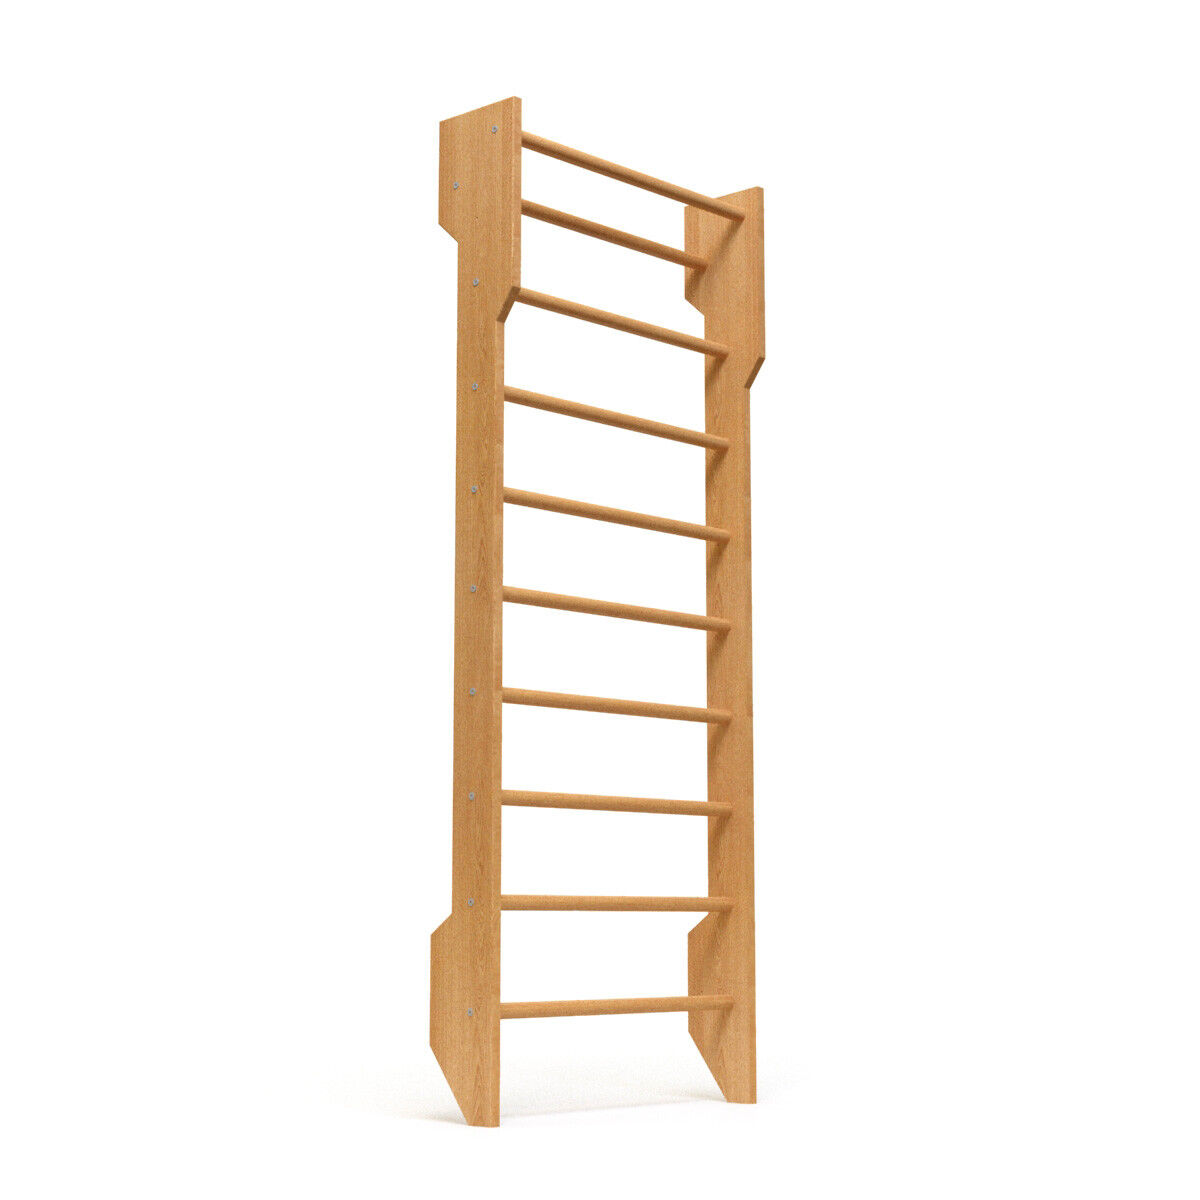 Swedish Ladder Sport Gymnastic Climbing Wall Bars Home Gym Workout